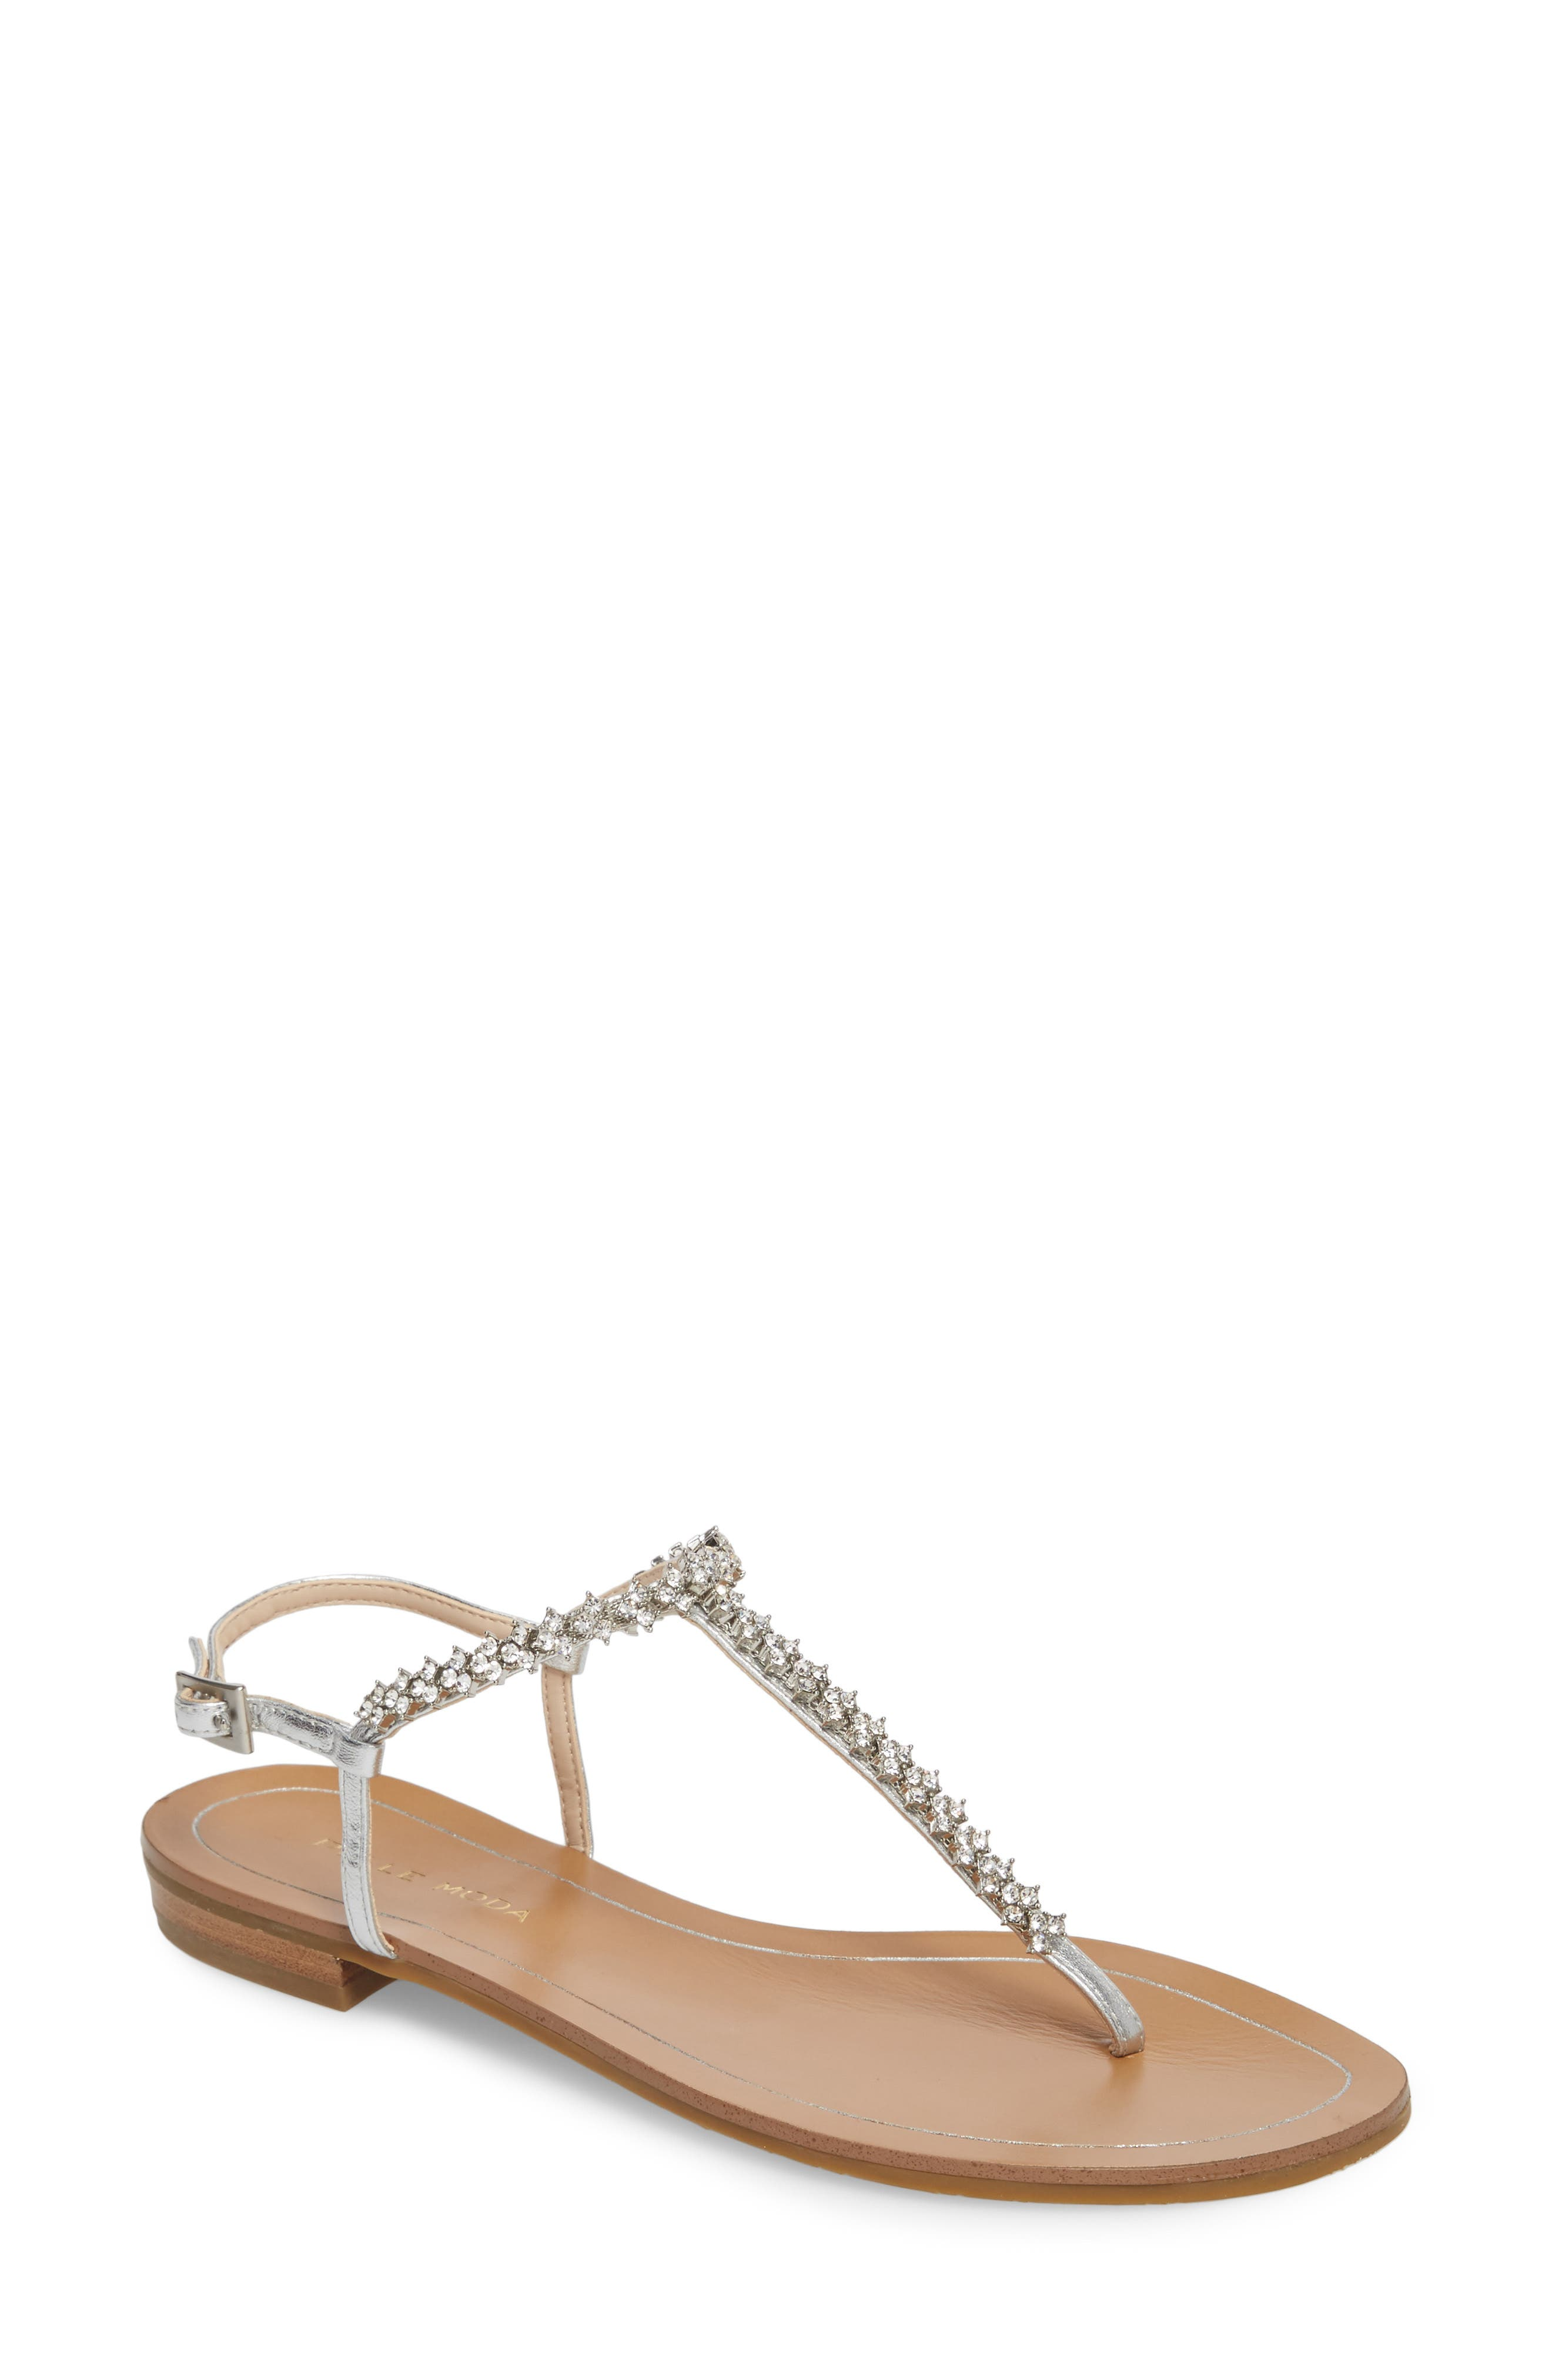 Main Image - Pelle Moda Baxley 4 Sandal (Women)